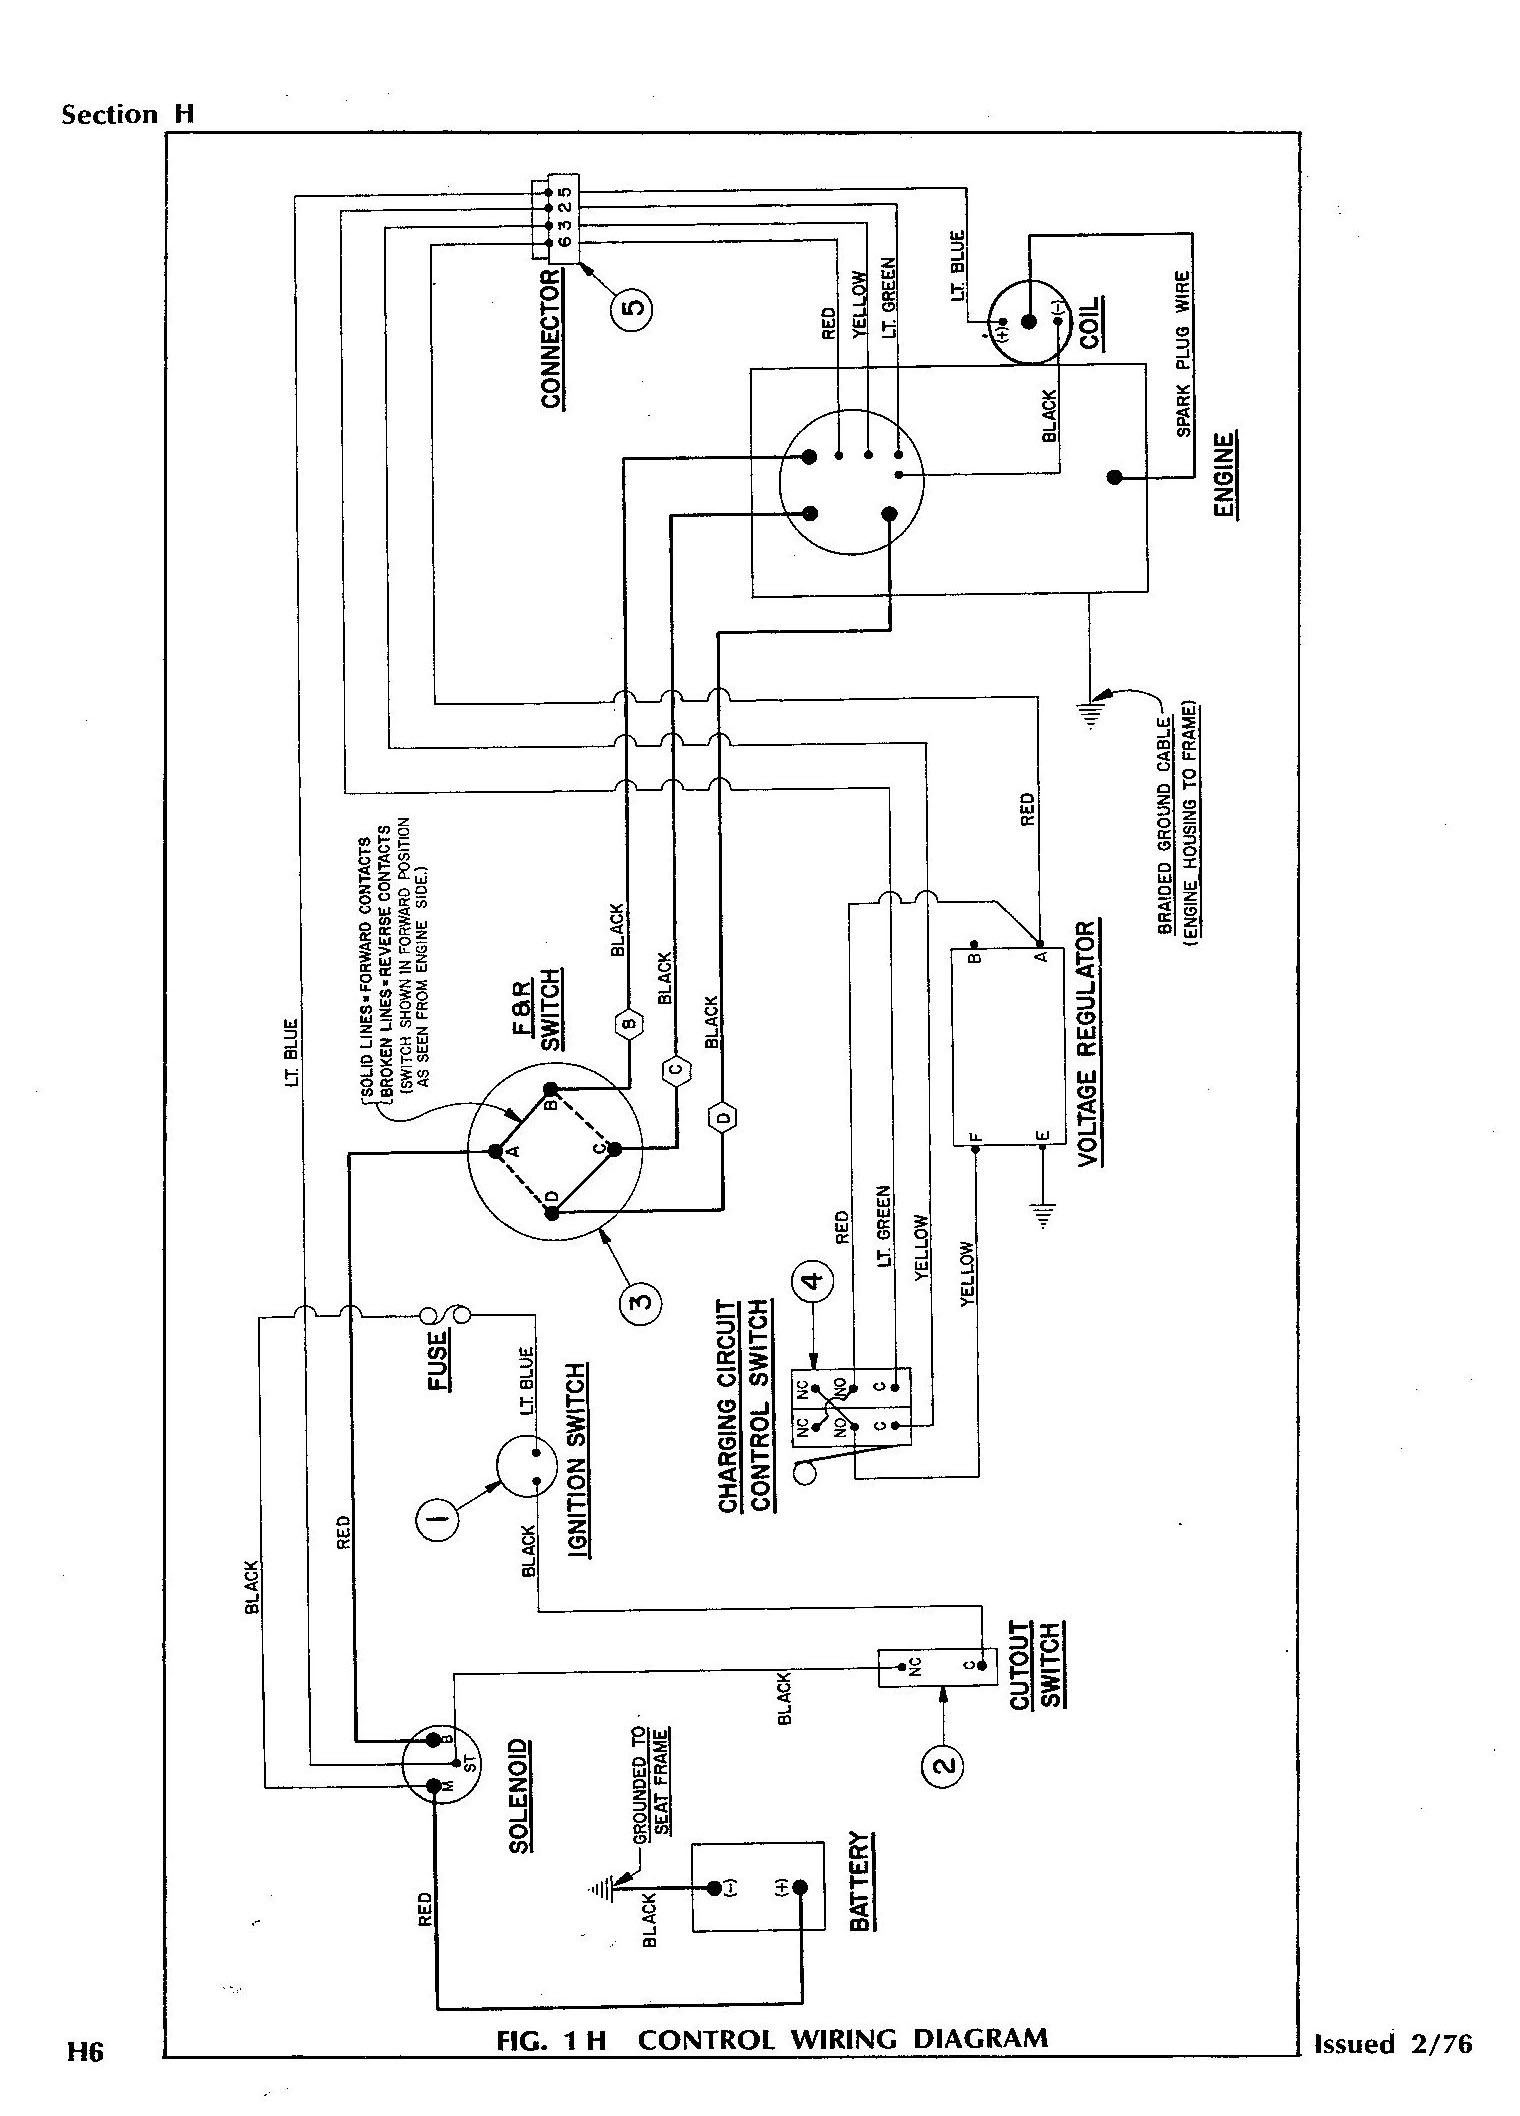 Diagram Of Club Car Parts 1963 Harley Davidson Golf Cart Wiring Diagram Free Download Wiring Of Diagram Of Club Car Parts